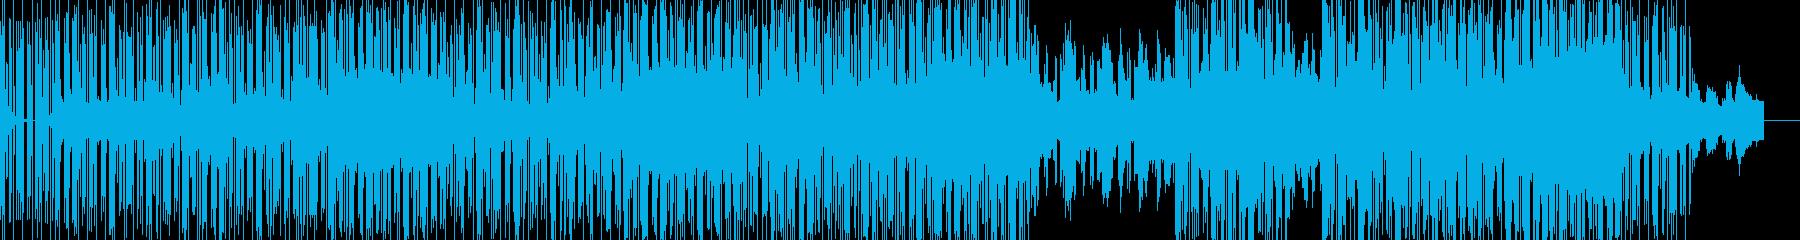 pianoメインなbreakbeatsの再生済みの波形